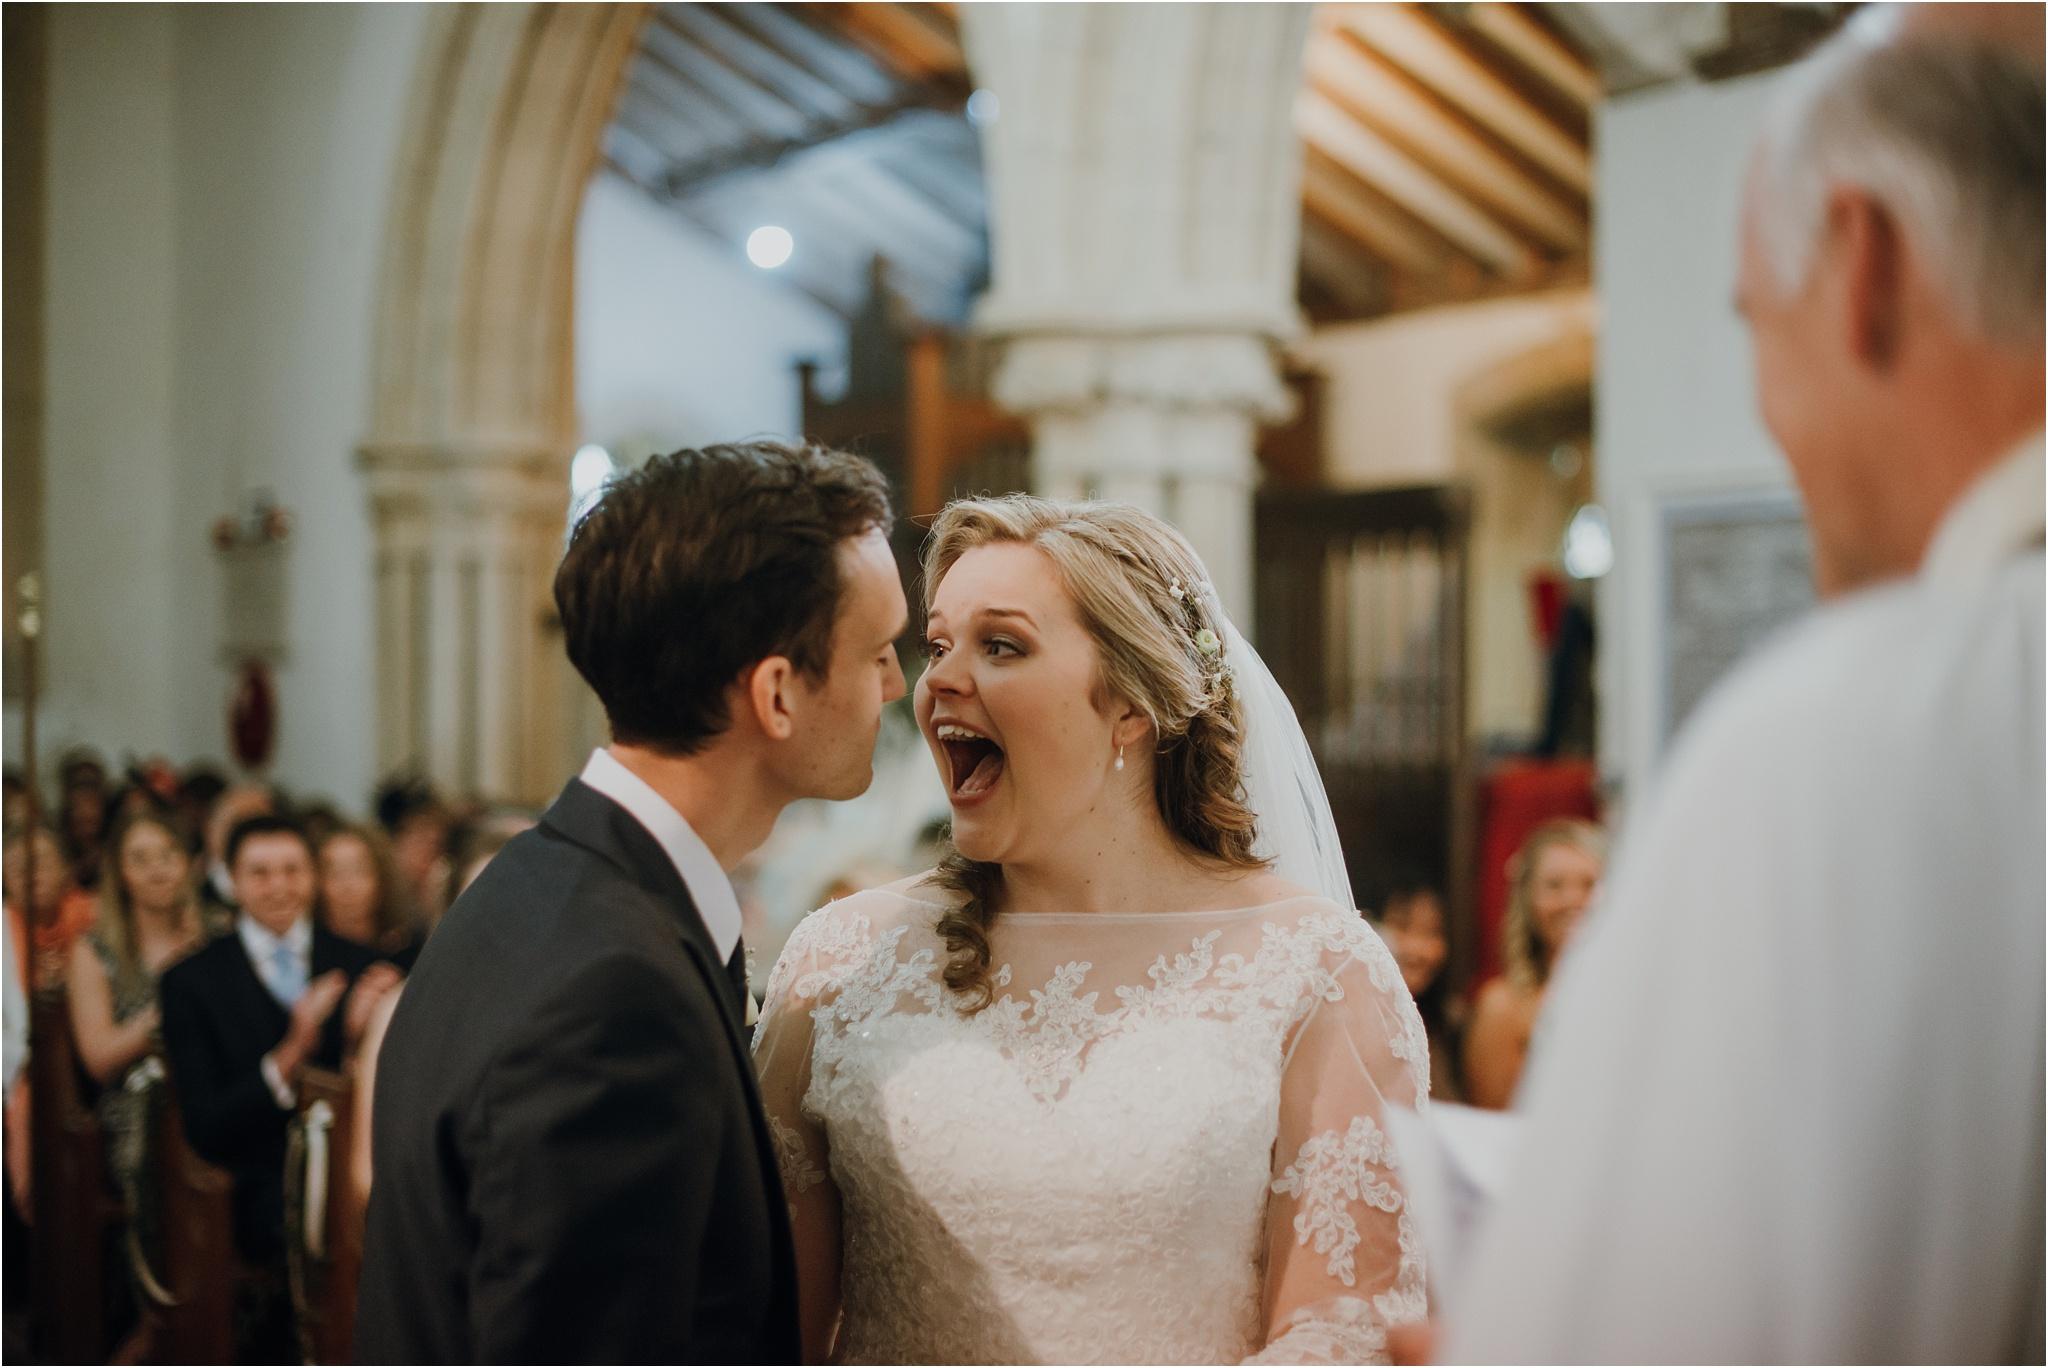 Outdoor-country-wedding-Edinburgh-photographer__0069.jpg